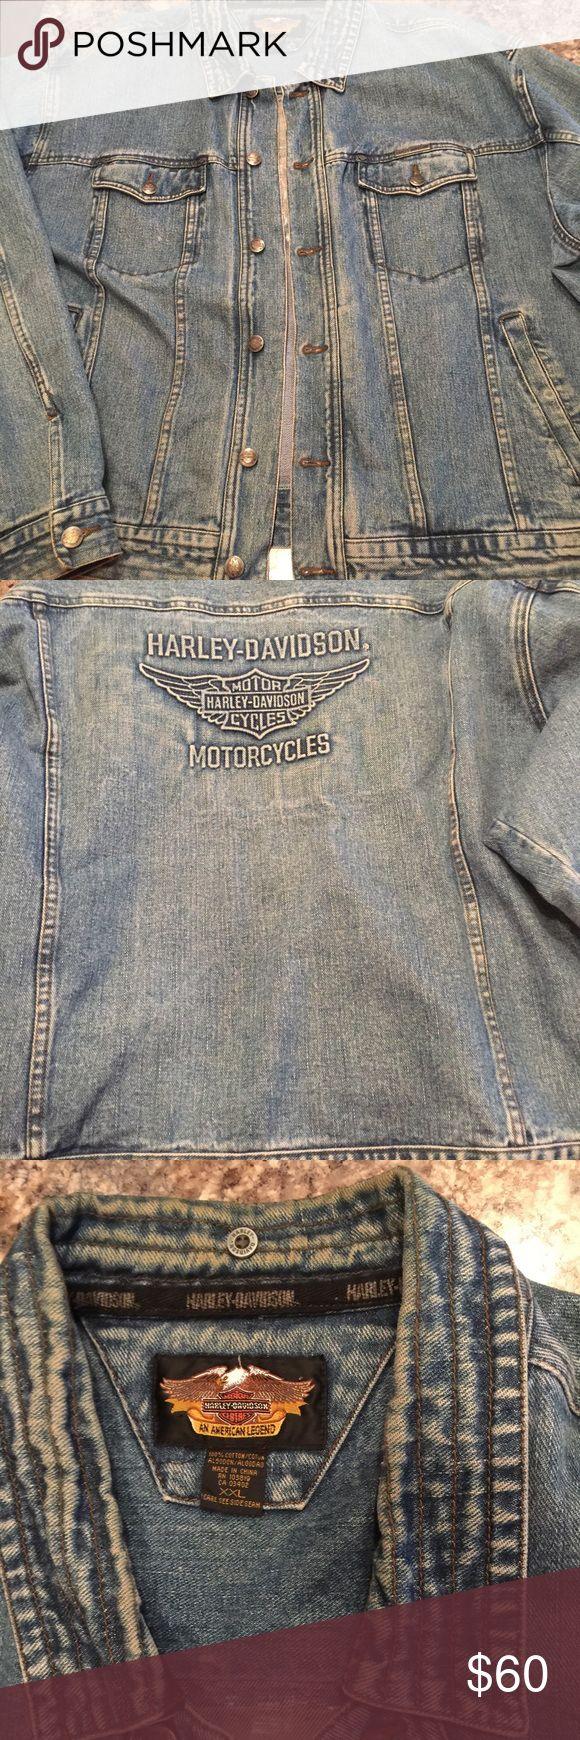 Harley Davidson Jean Jacket Harley Davidson men's jean jacket. Zip in lining not included. Good condition. Harley-Davidson Jackets & Coats